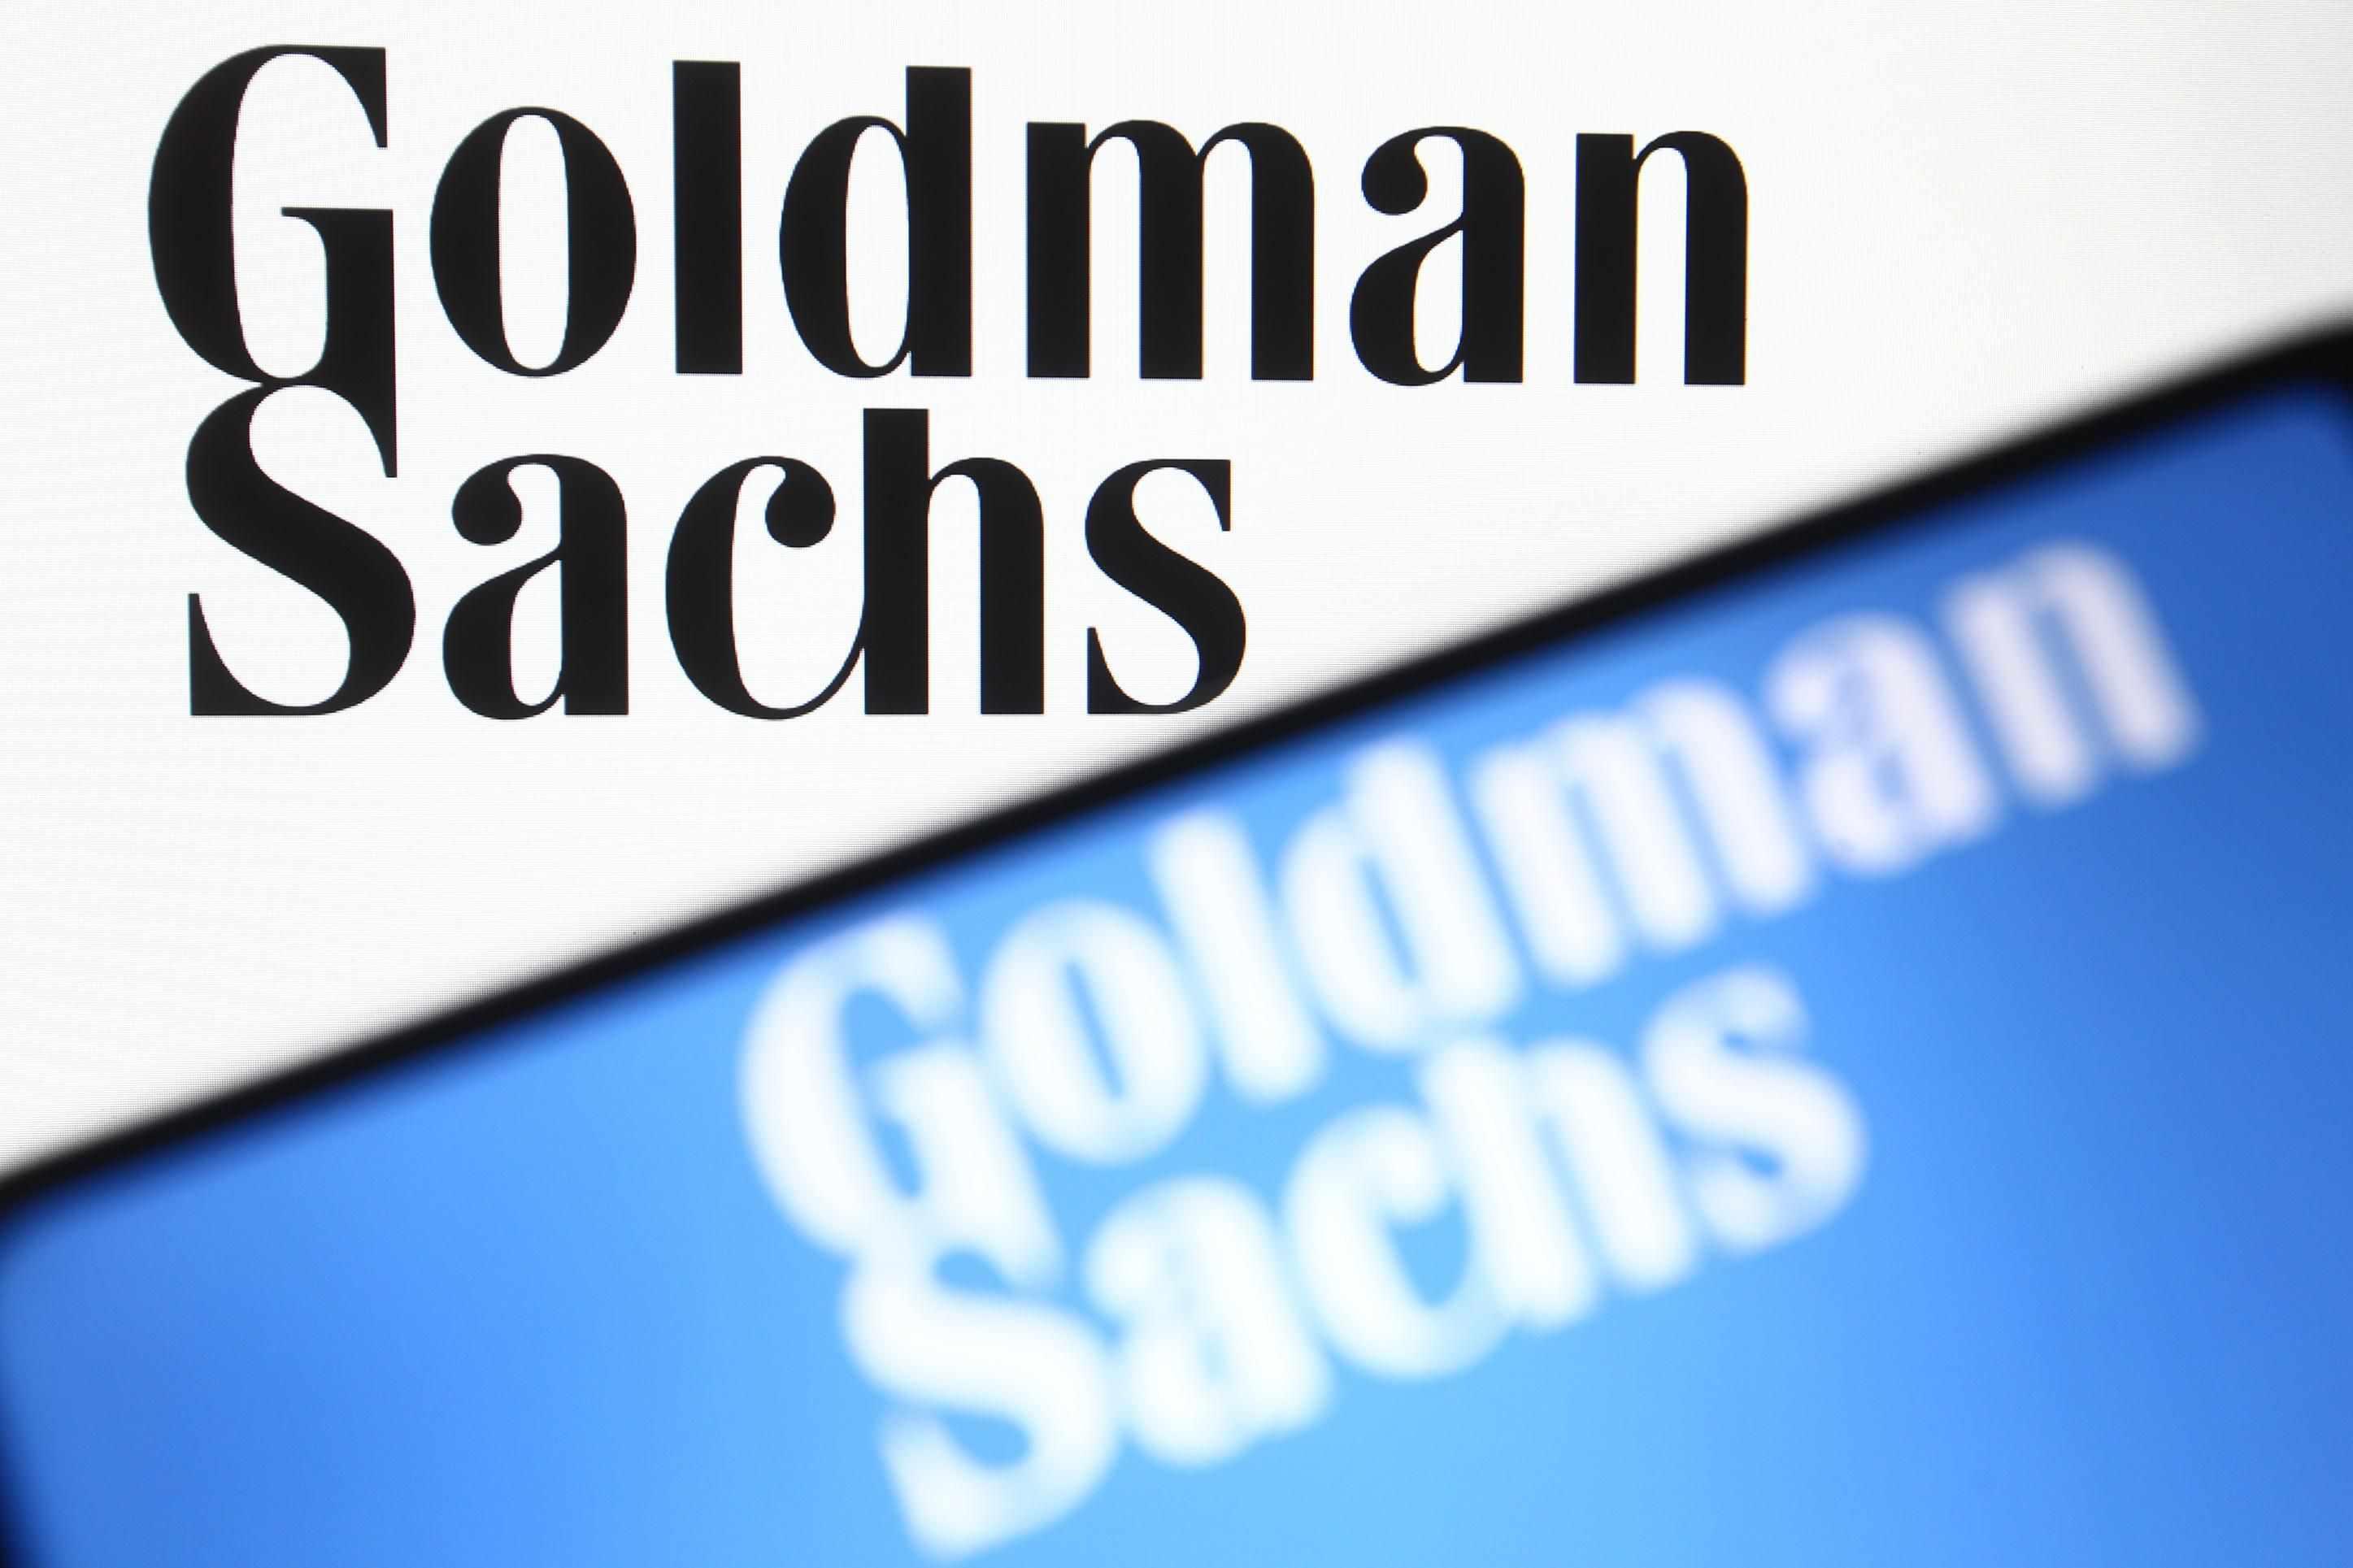 goldman sachs stock surpass expectations